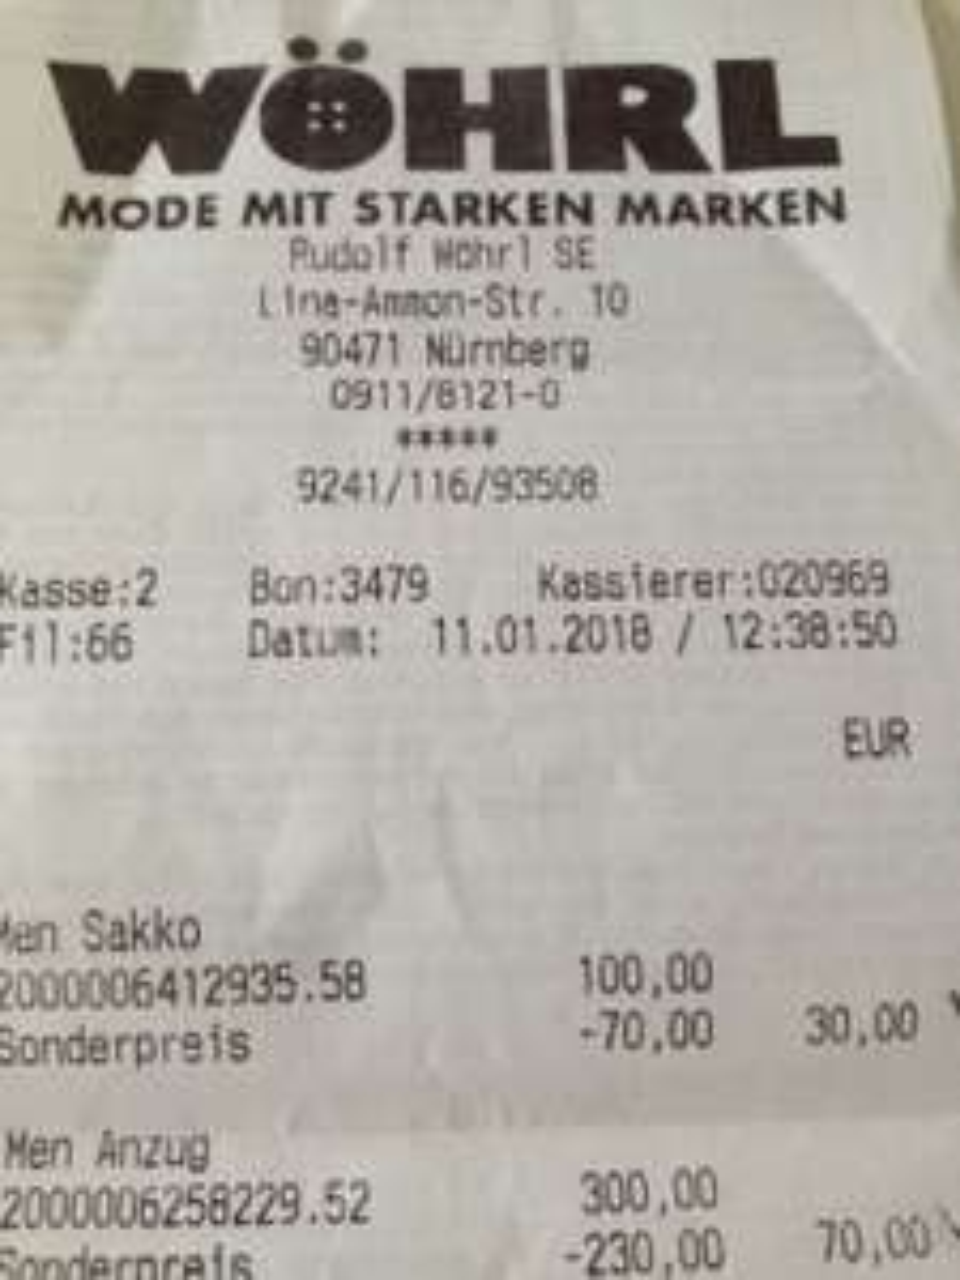 Wöhrl in Nürnberg (Lina-Ammon-Str. 10) Räumungsverkauf - Sakko 30 €, Anzug 70 €, Hemd 10 €